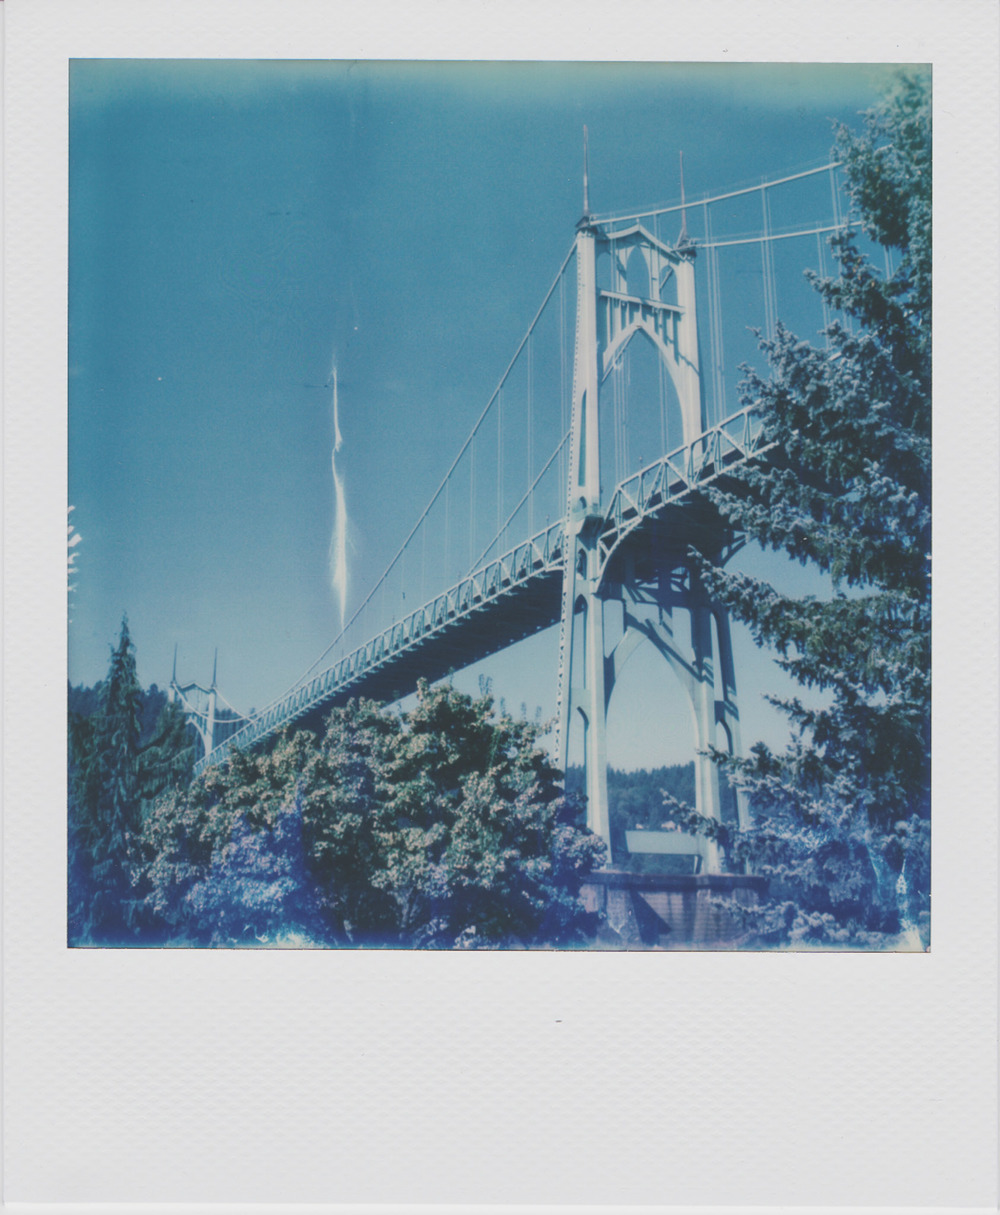 St. John's Bridge | Polaroid SX-70 | Impossible Project Film | Daniel Hedrick